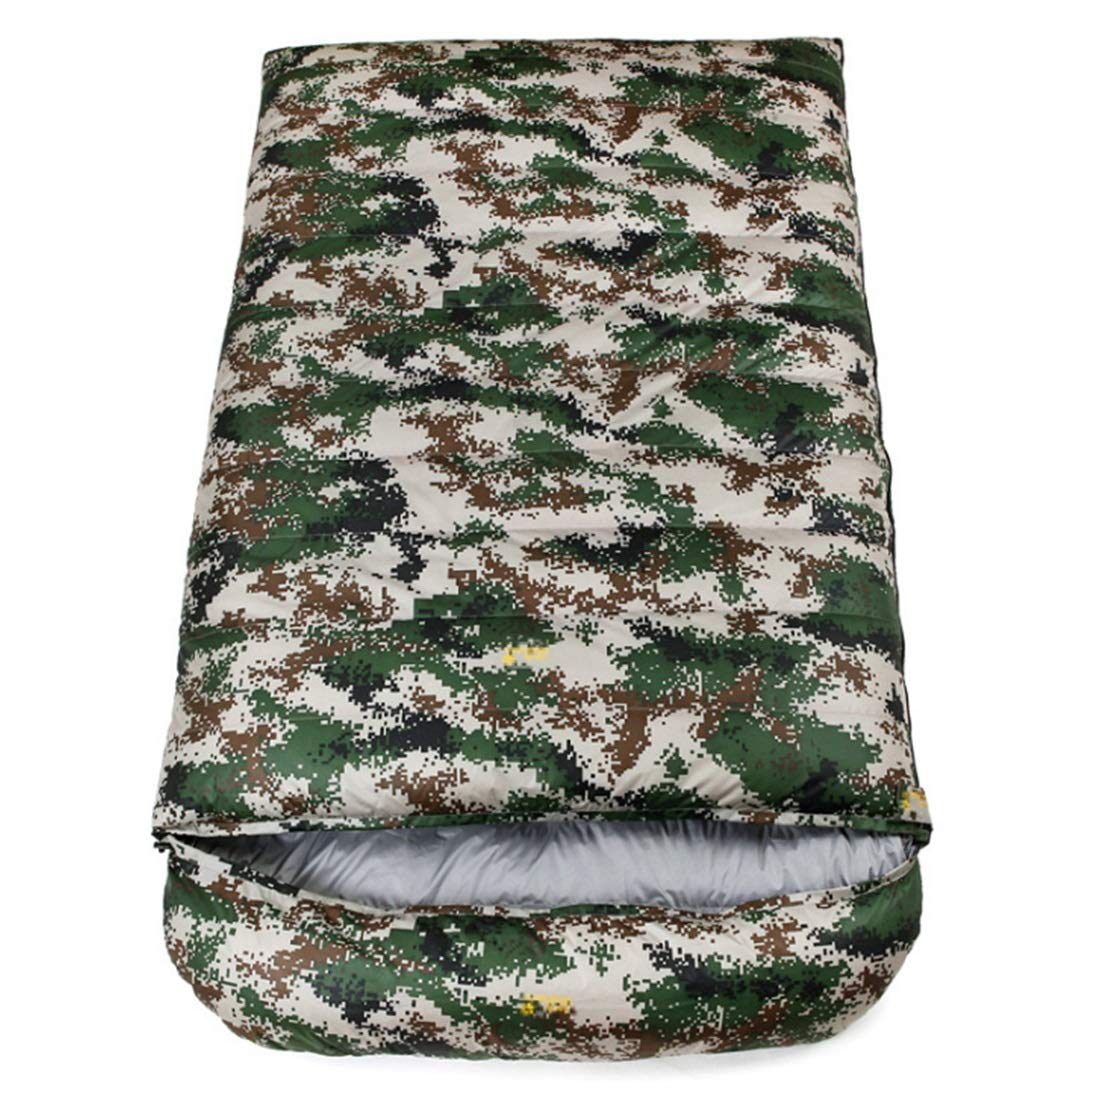 Jhcpca 旅行用、キャンプ用、ハイキング 遠足 超軽量 寝袋 (Color : レッド, サイズ : 1500g) B07KT5YTSH Camouflage 1000g 1000g|Camouflage